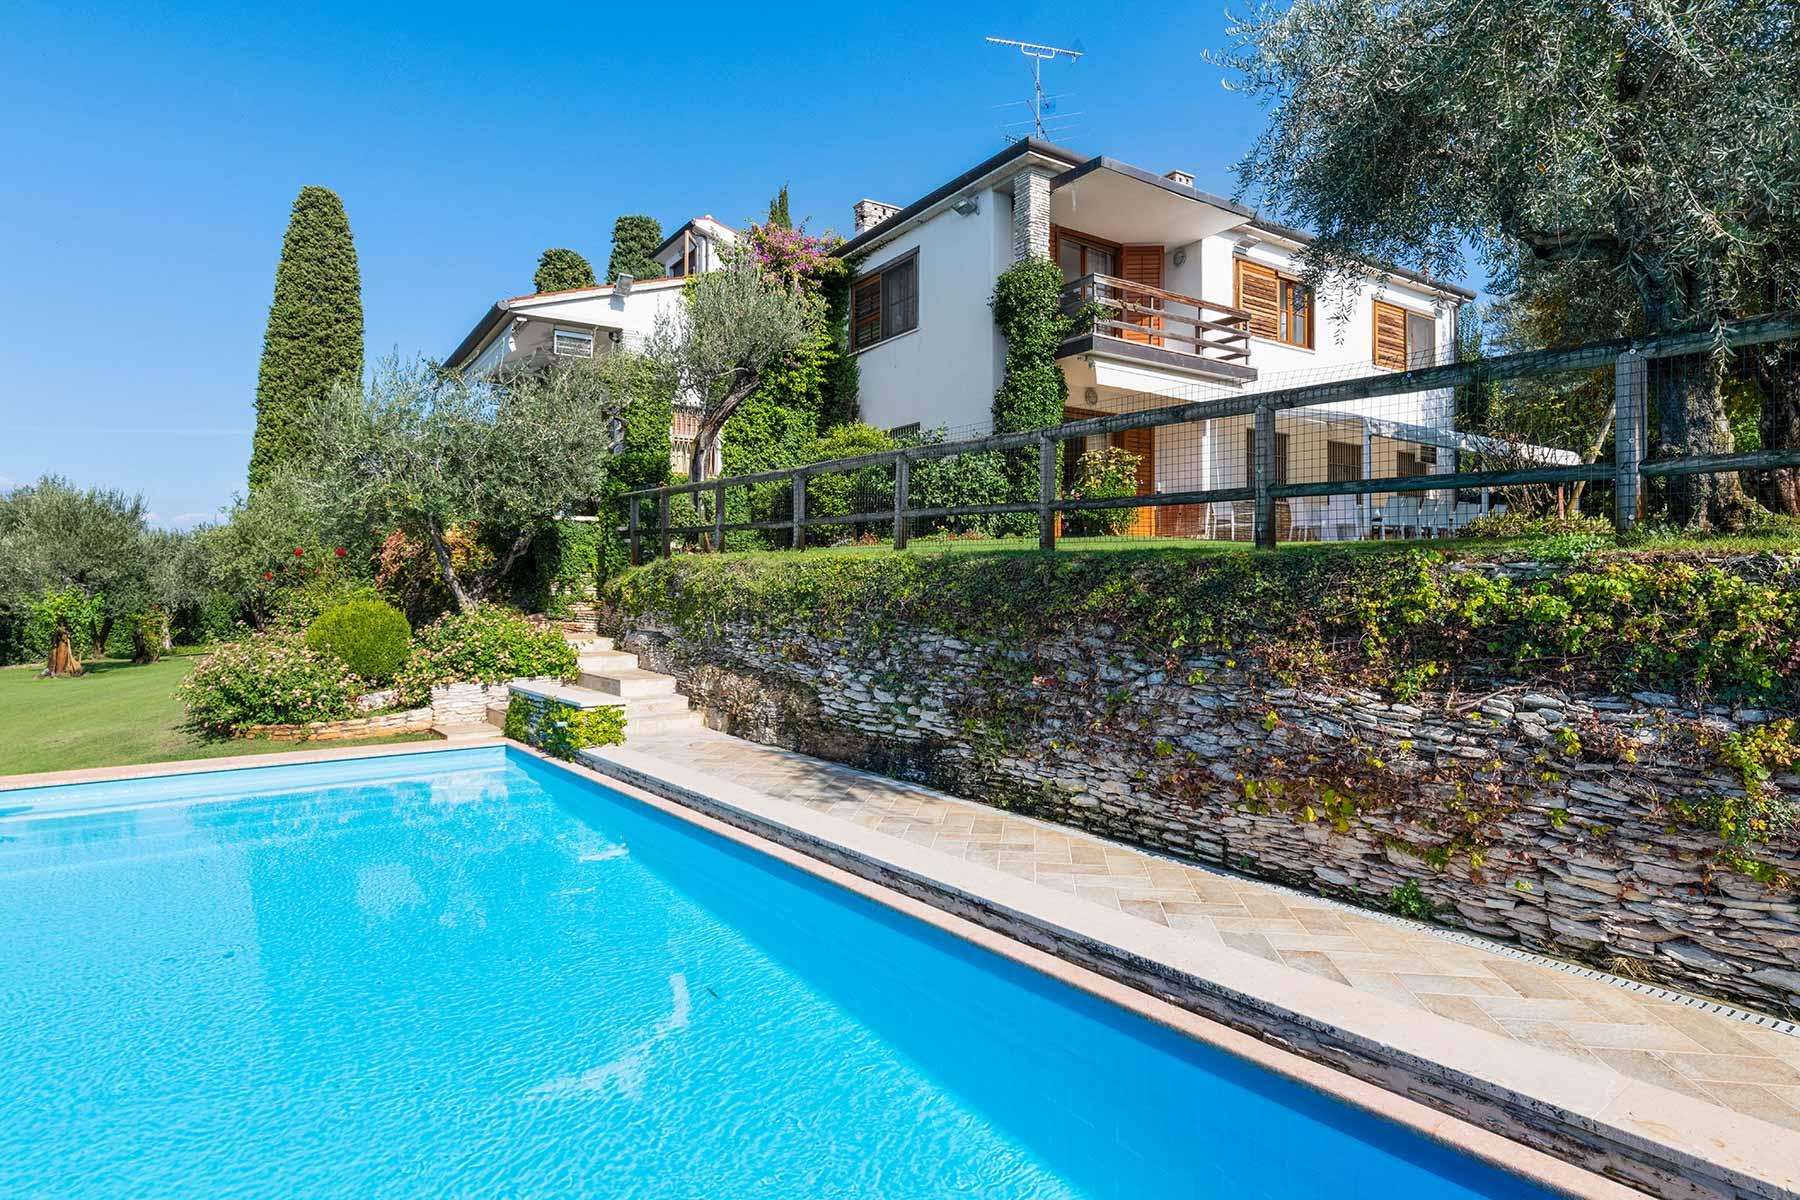 Villa in Vendita a Sirmione: 5 locali, 500 mq - Foto 7